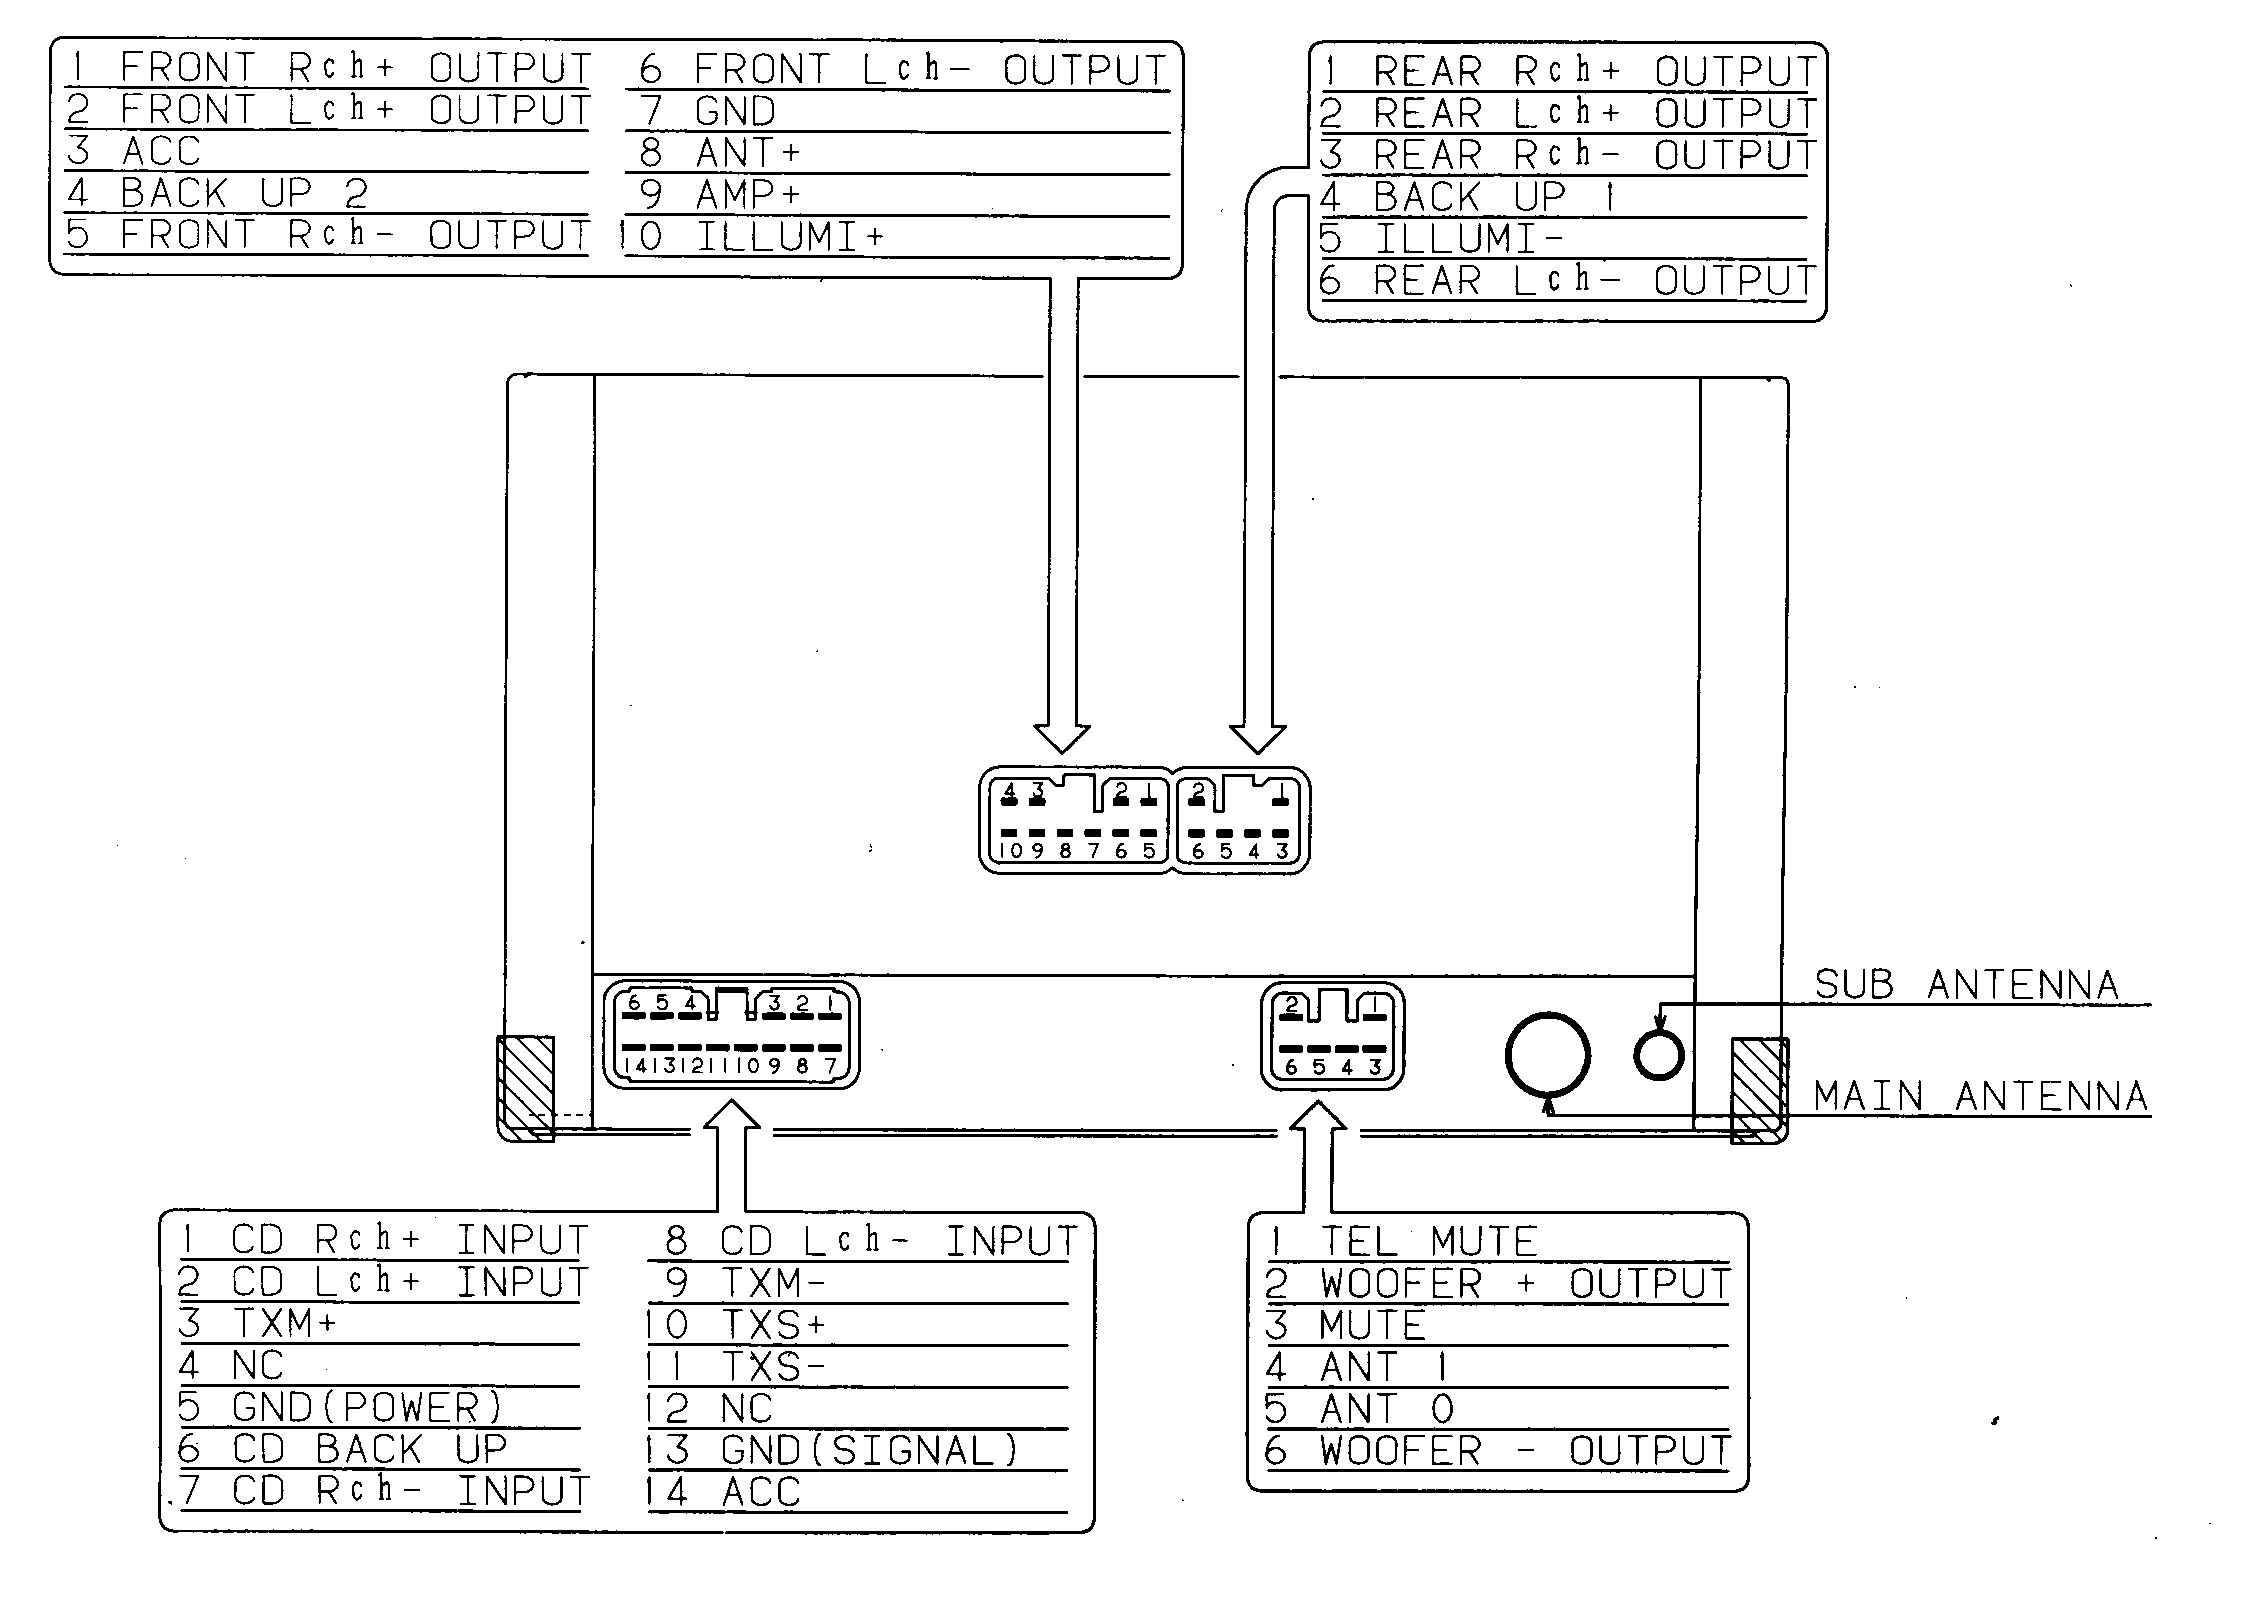 1998 Lexus Es300 Engine Diagram Wiring Diagram as Well toyota Radio Wiring Harness Moreover 1998 Of 1998 Lexus Es300 Engine Diagram